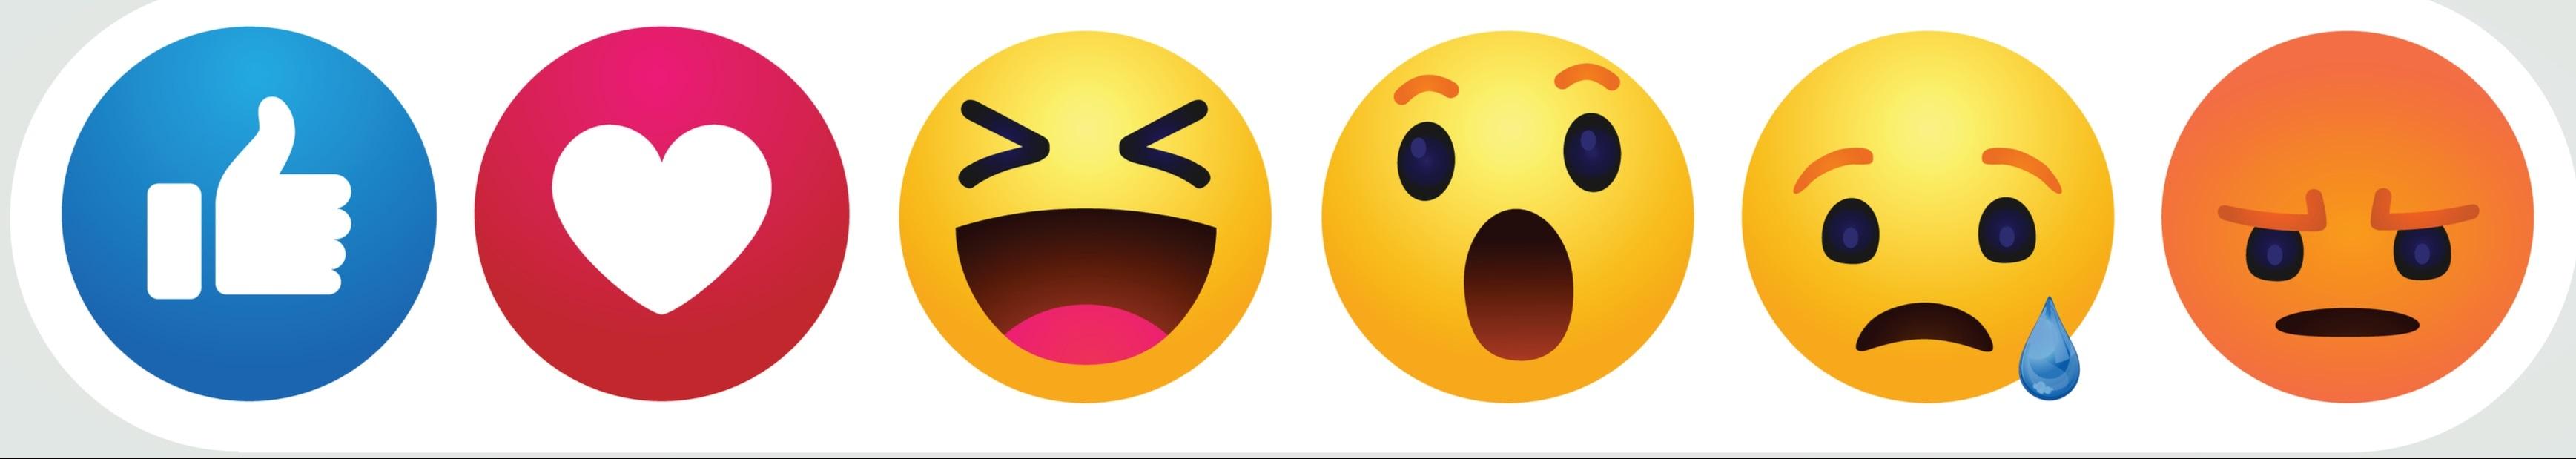 Facebook emoji banner